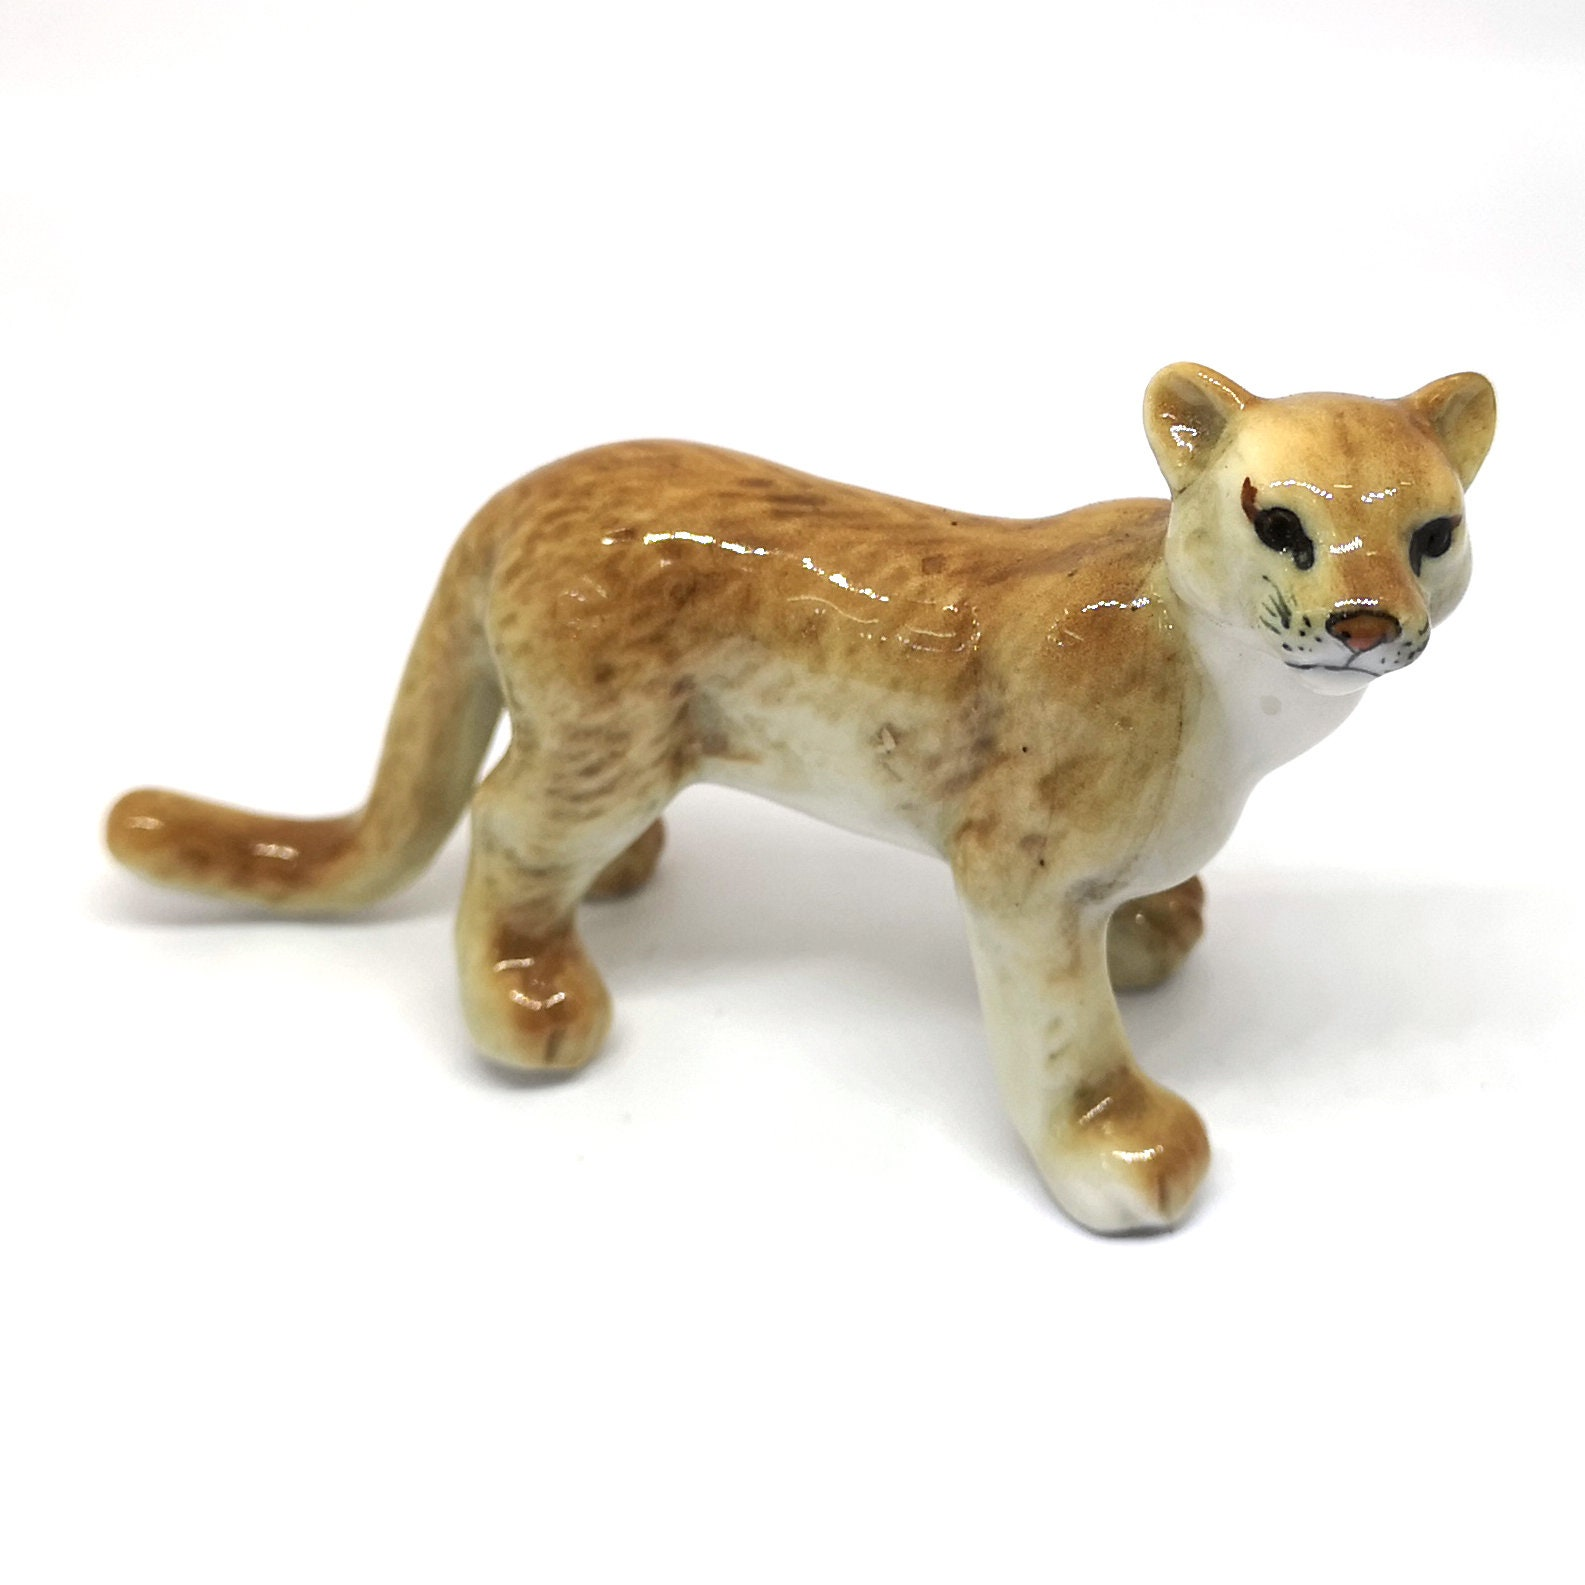 ZOOCRAFT Puma Wildlife Porcelain Tiger Figurine Statue Handmade Zoo Collectibles Decor